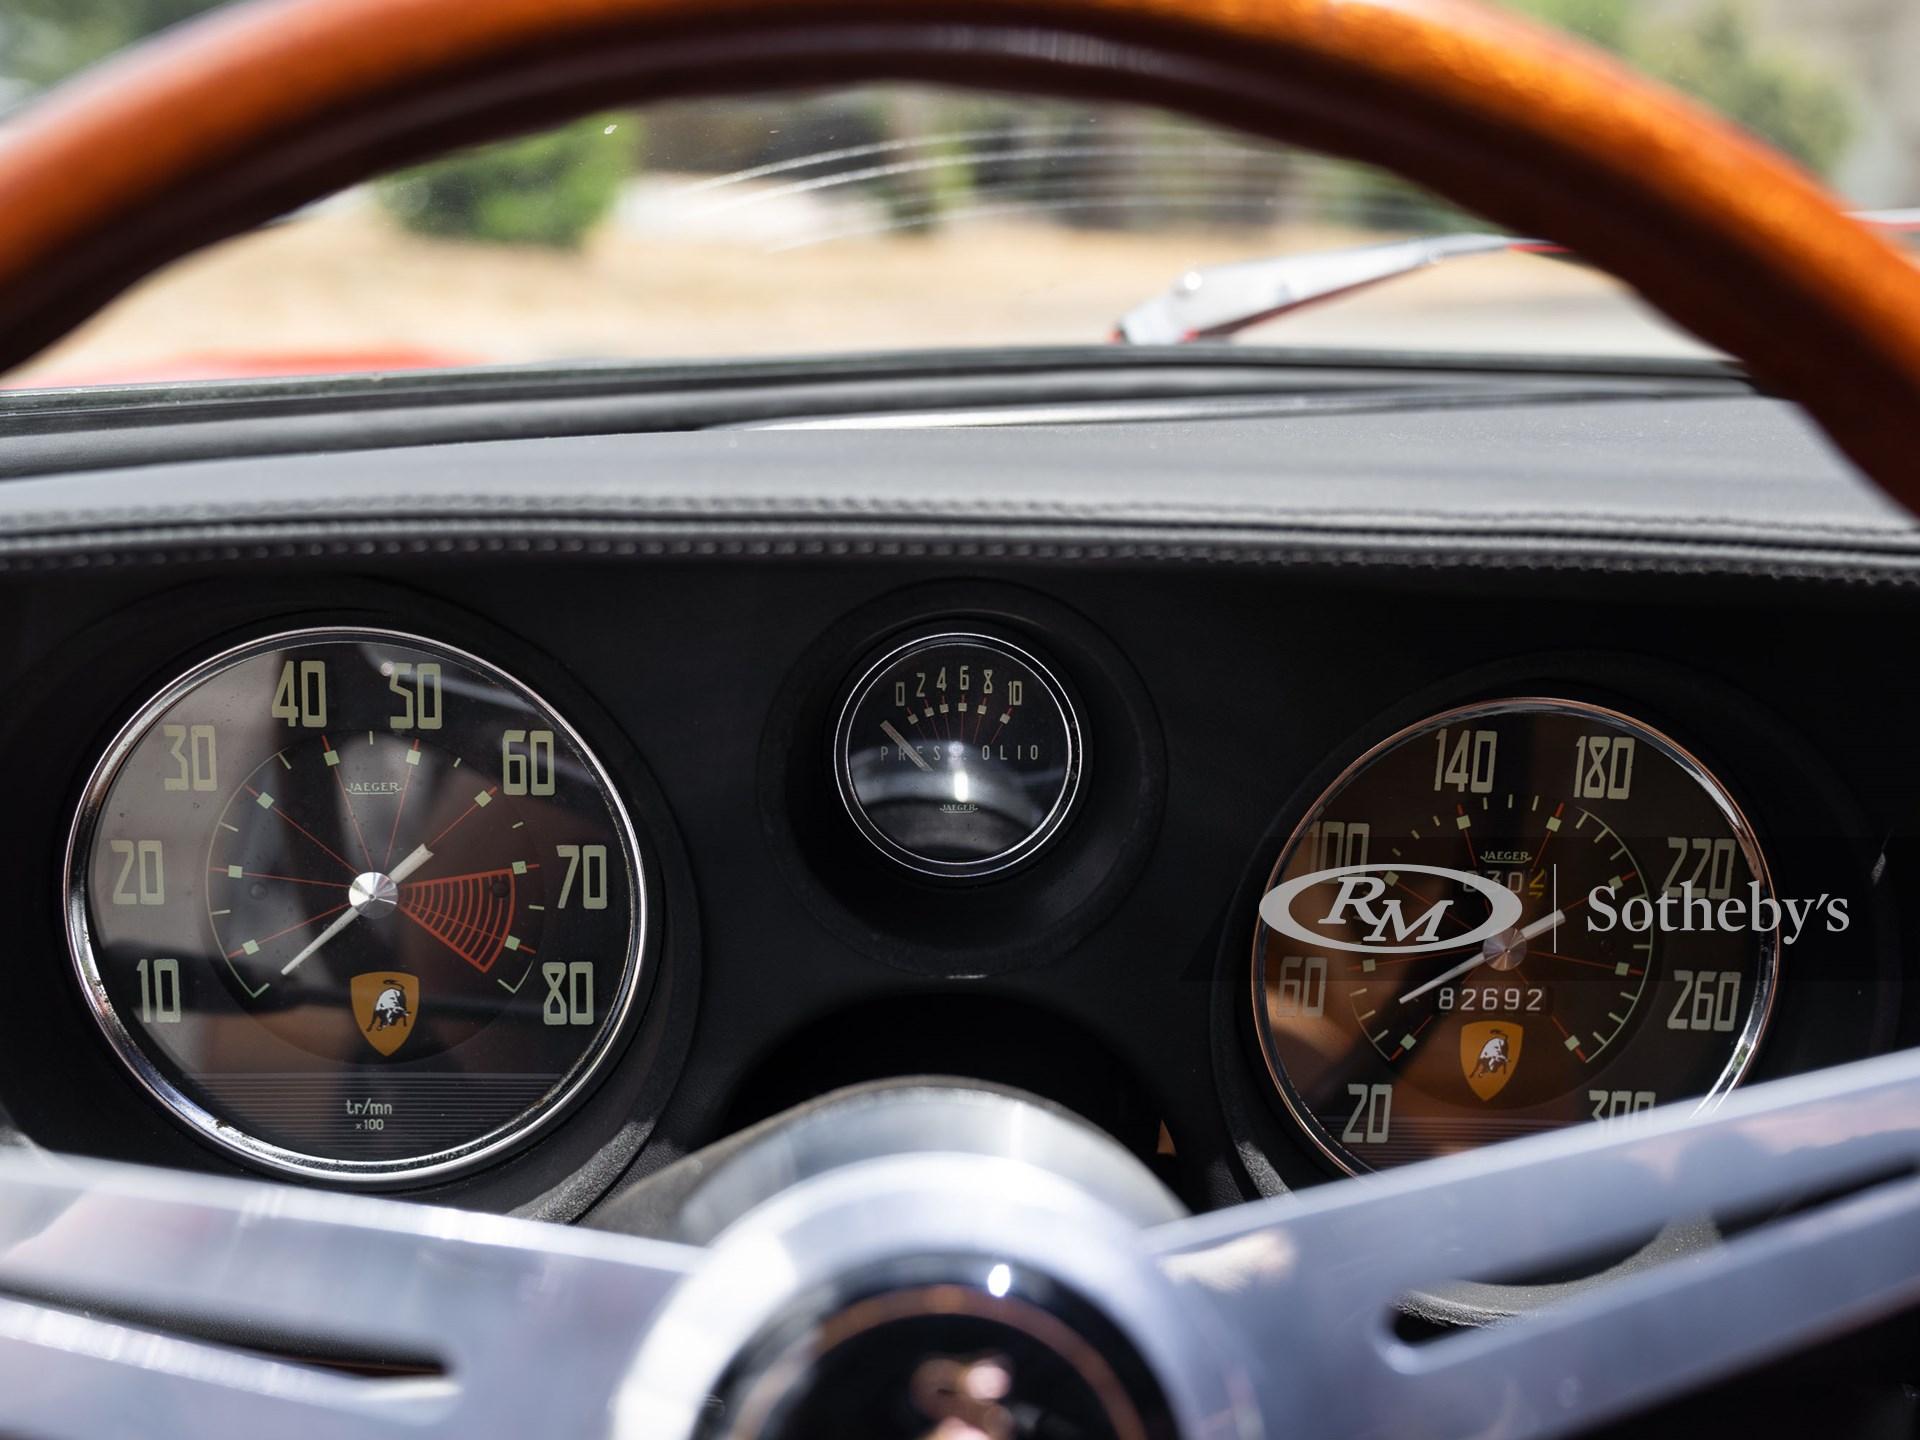 1967 Lamborghini 400 GT 2+2 by Touring -